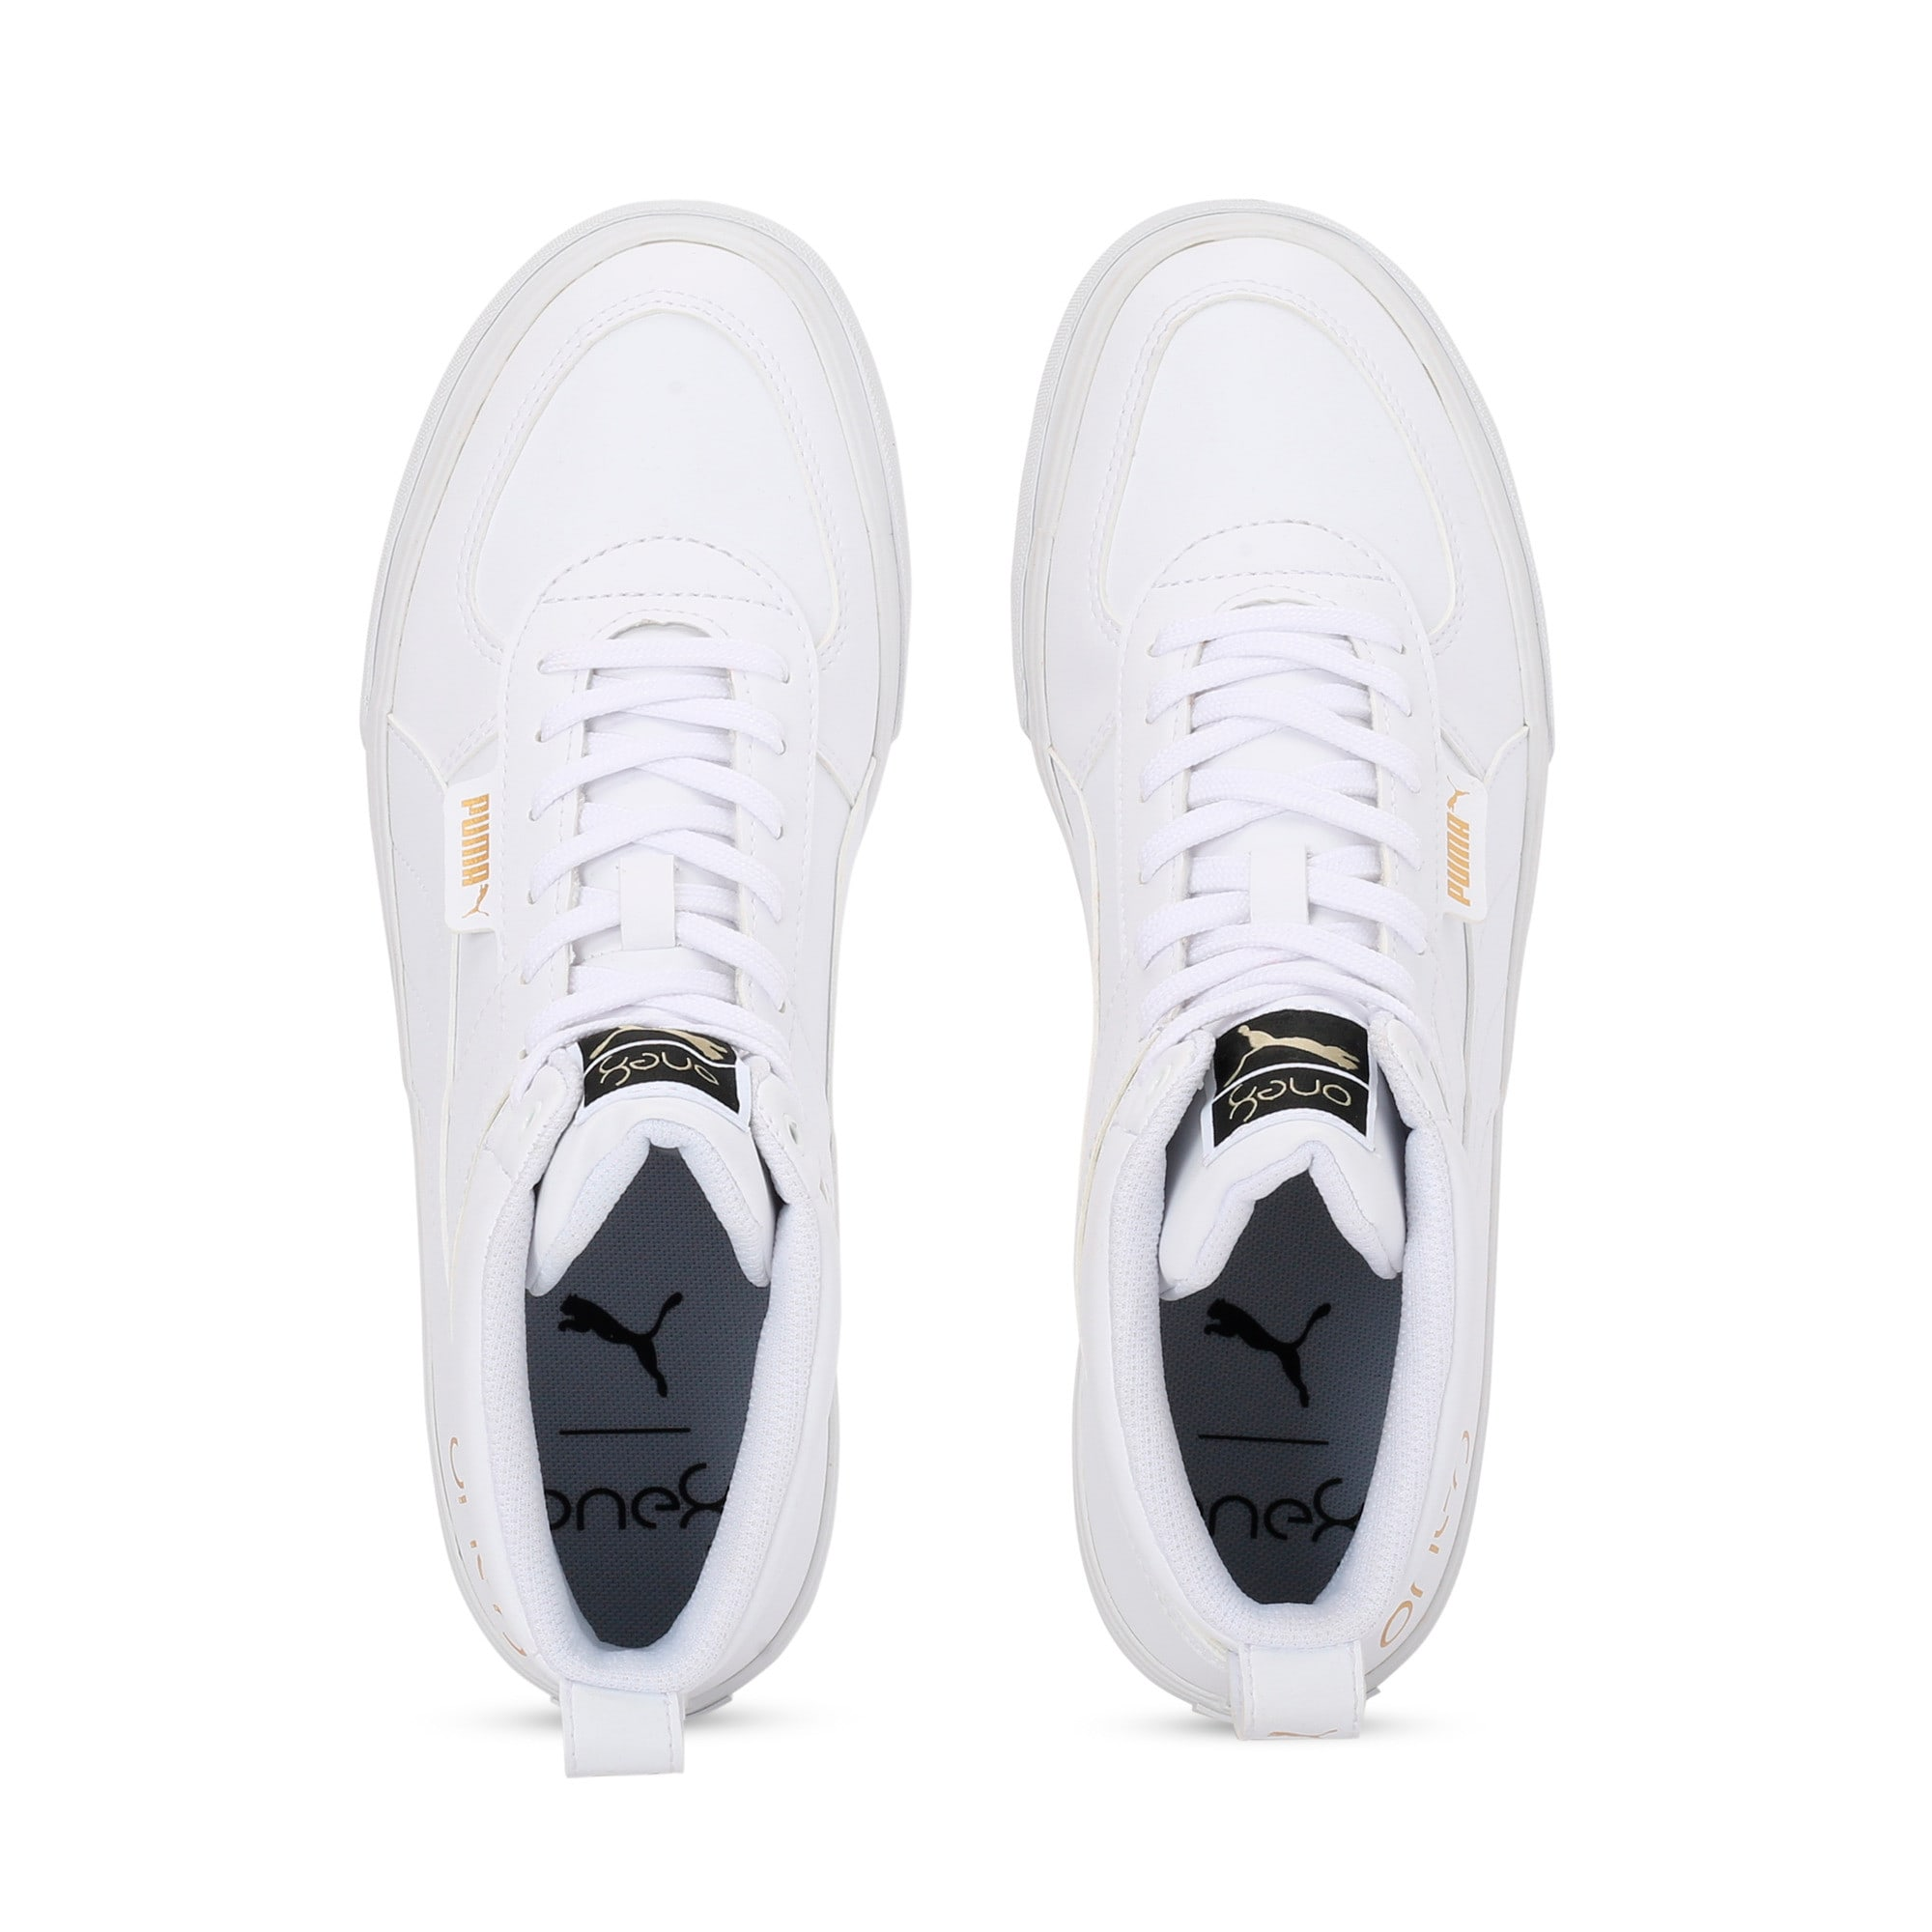 Thumbnail 6 of one8 Mid Men's Sneakers, Puma White-Puma Team Gold, medium-IND